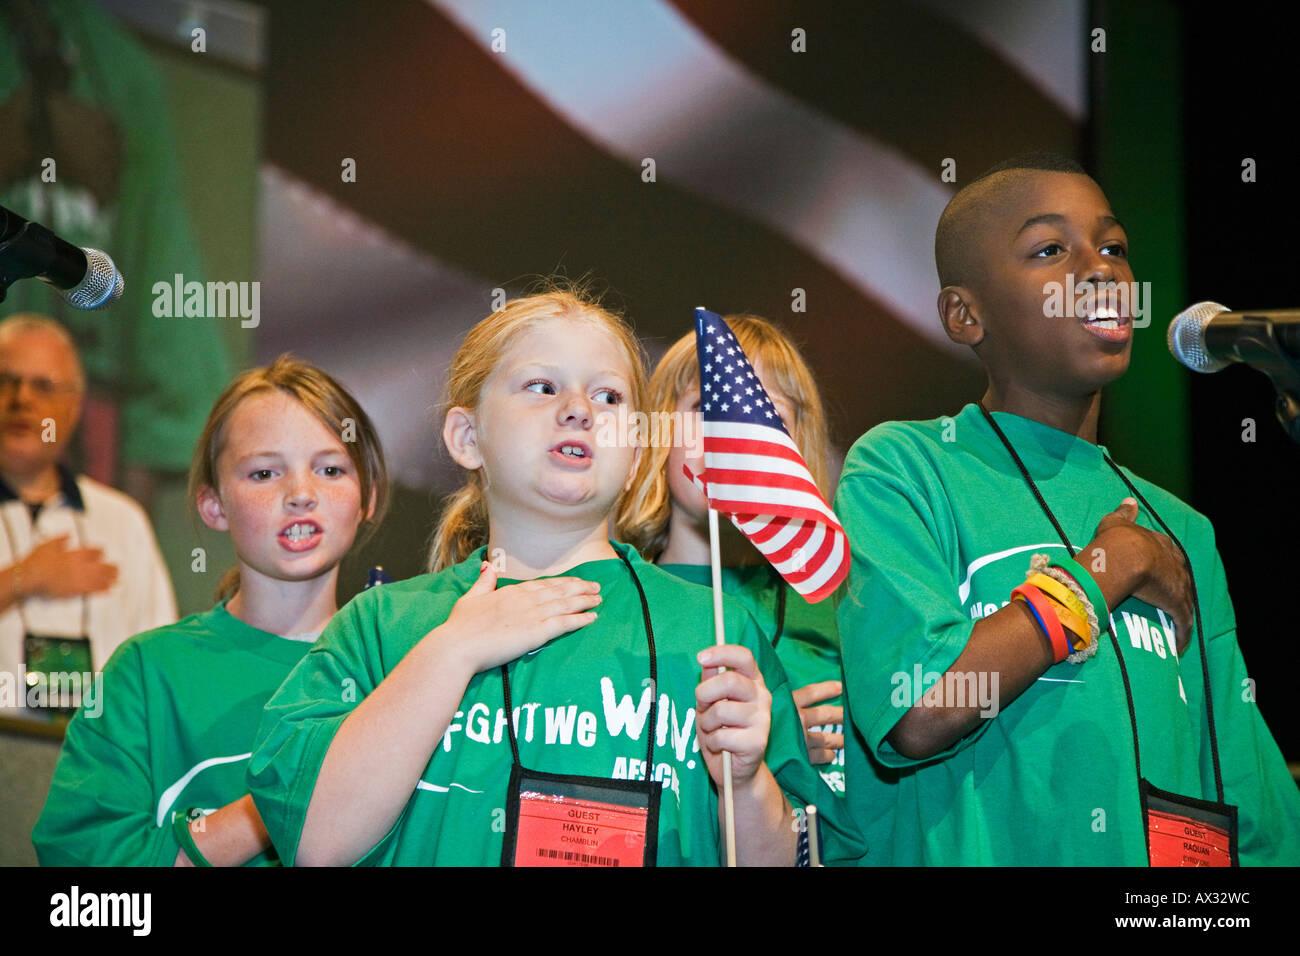 Children Say Pledge of Allegiance - Stock Image